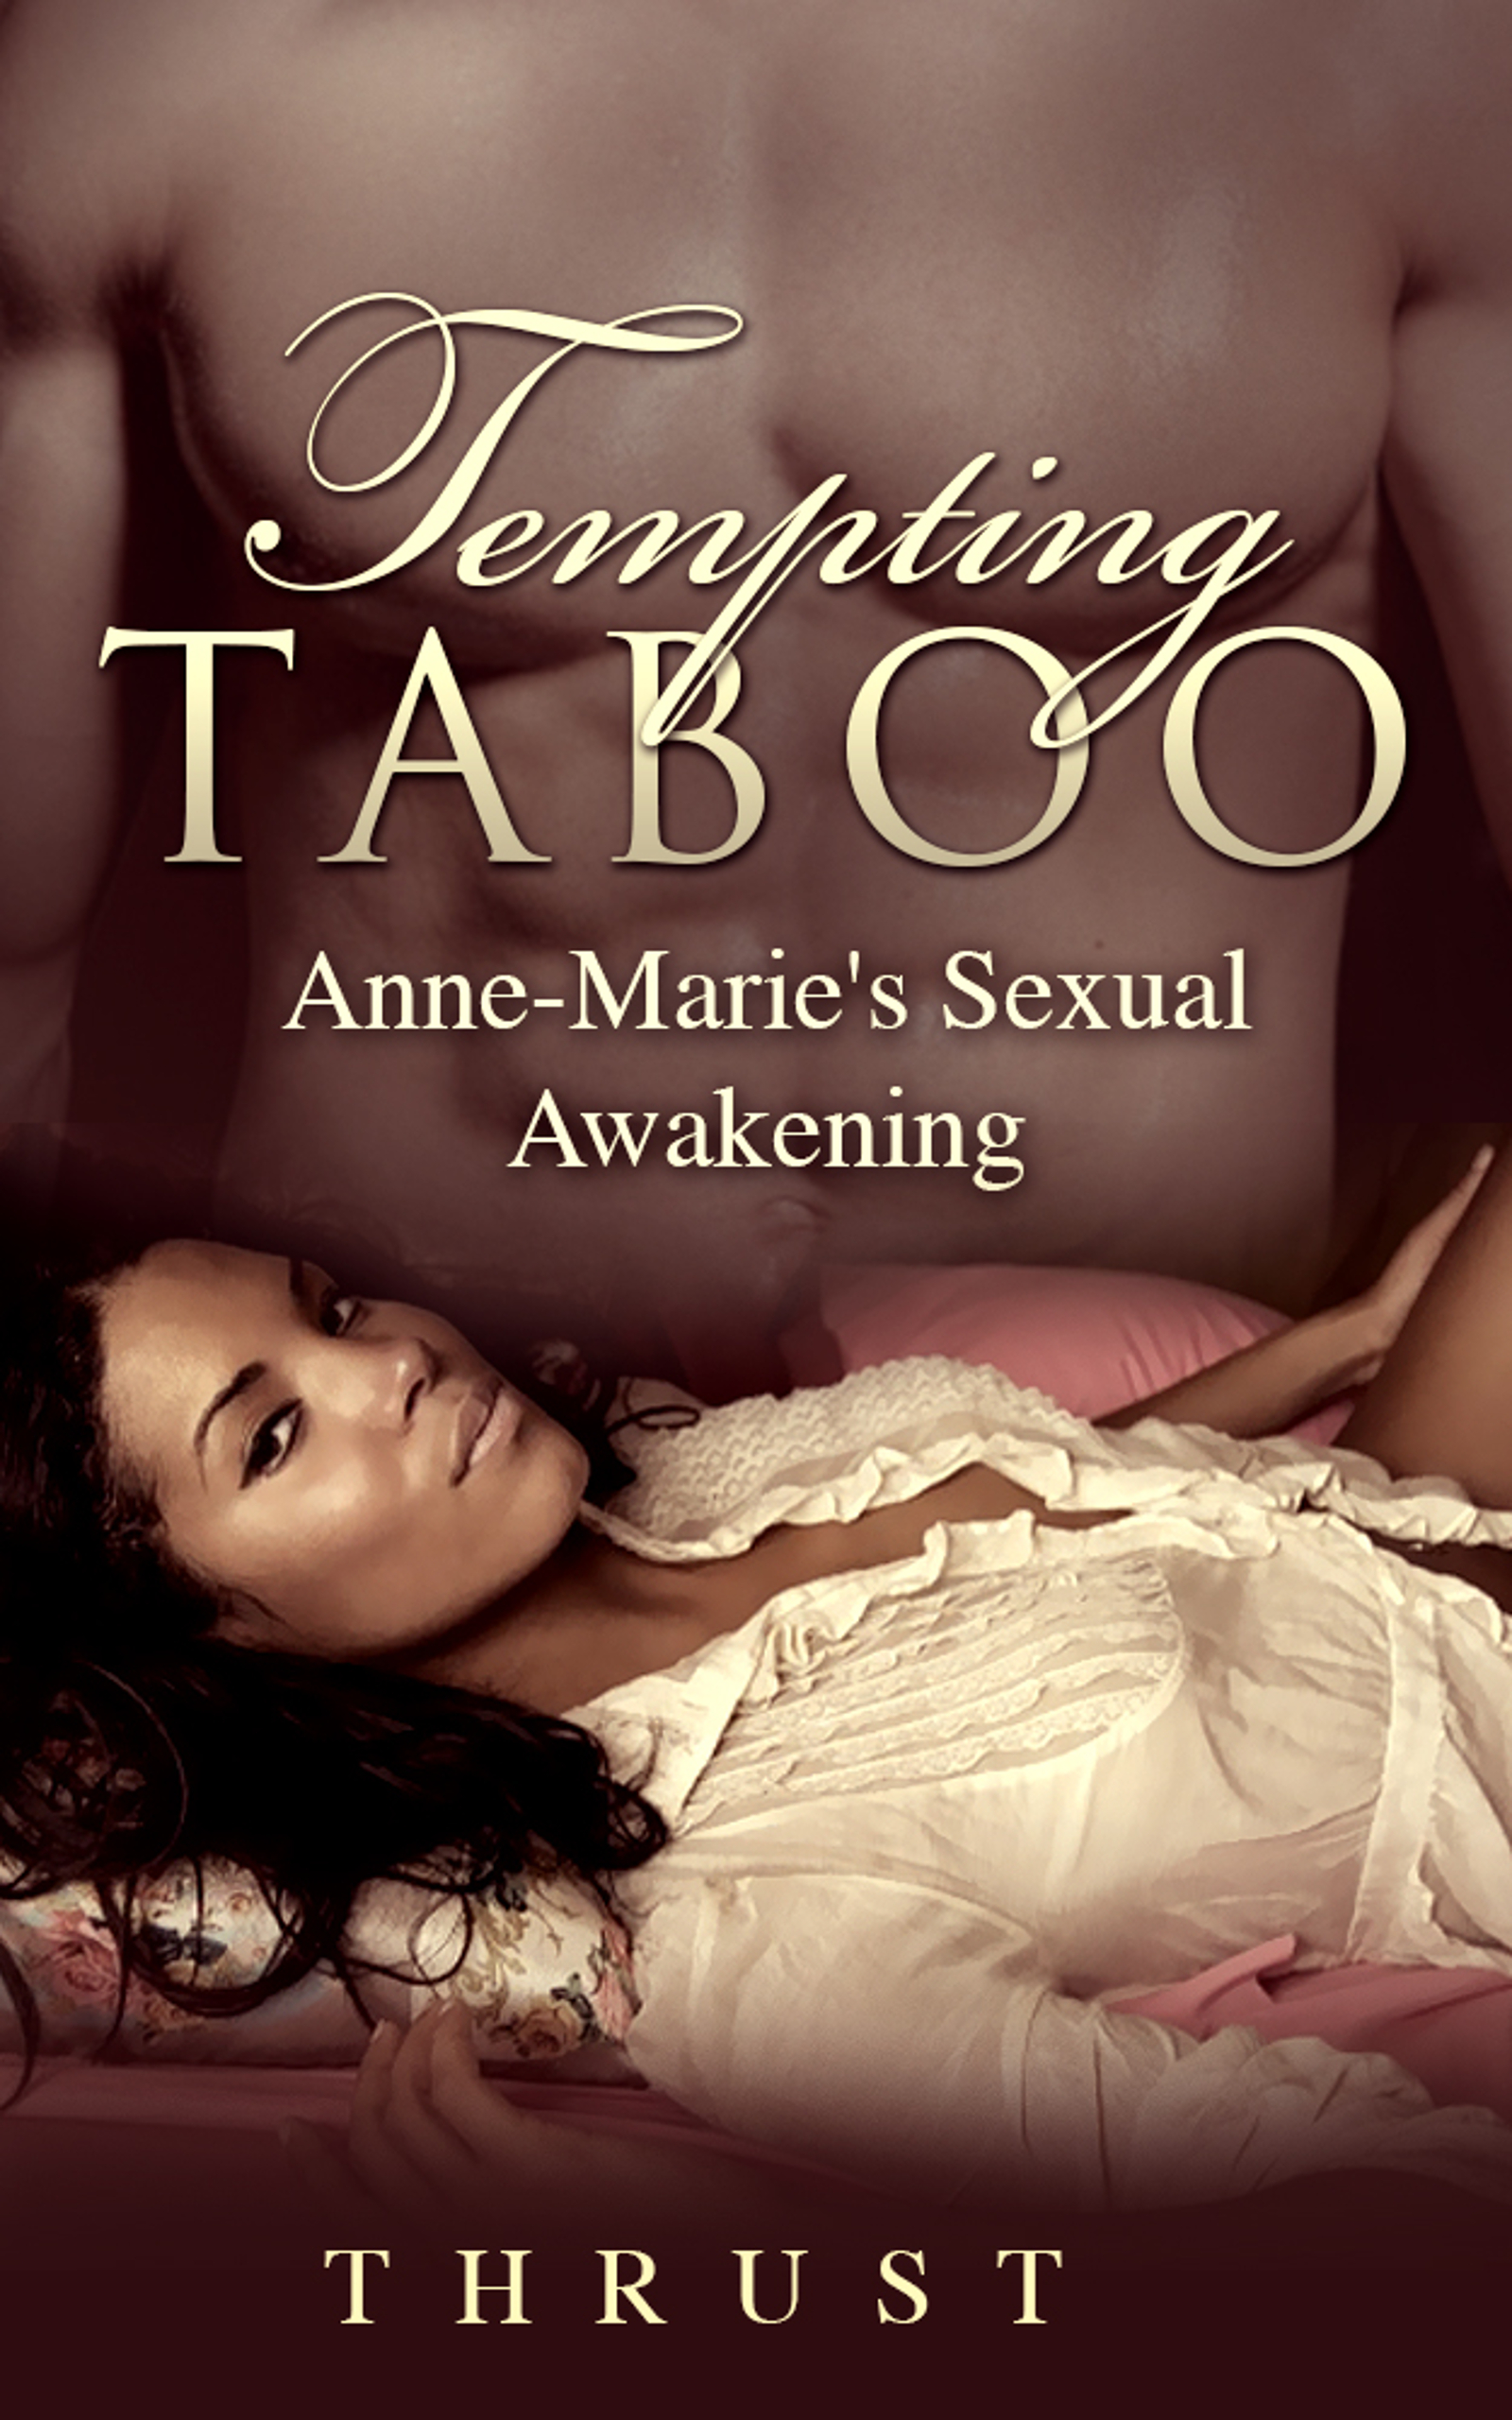 American Taboo Movie tempting taboo: anne-marie's sexual awakening (pseudo incest, daddy  daughter, african american, teenage virgin erotica), an ebookthrust